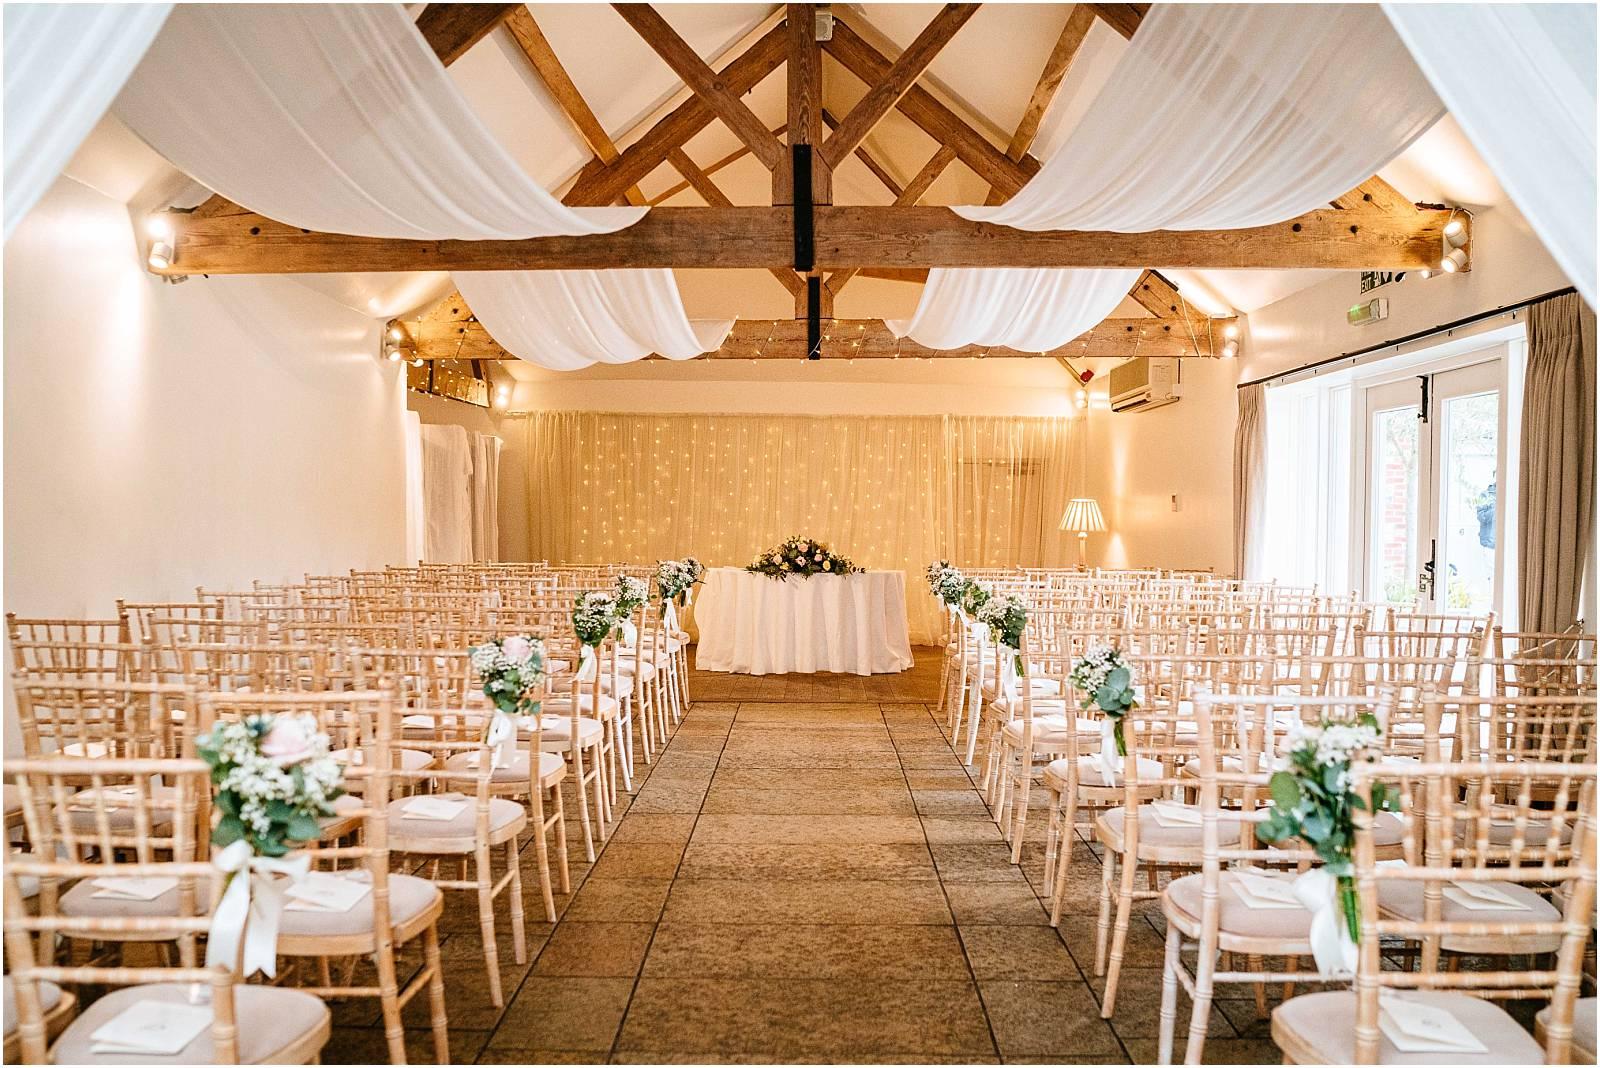 farbridge set up for wedding ceremony